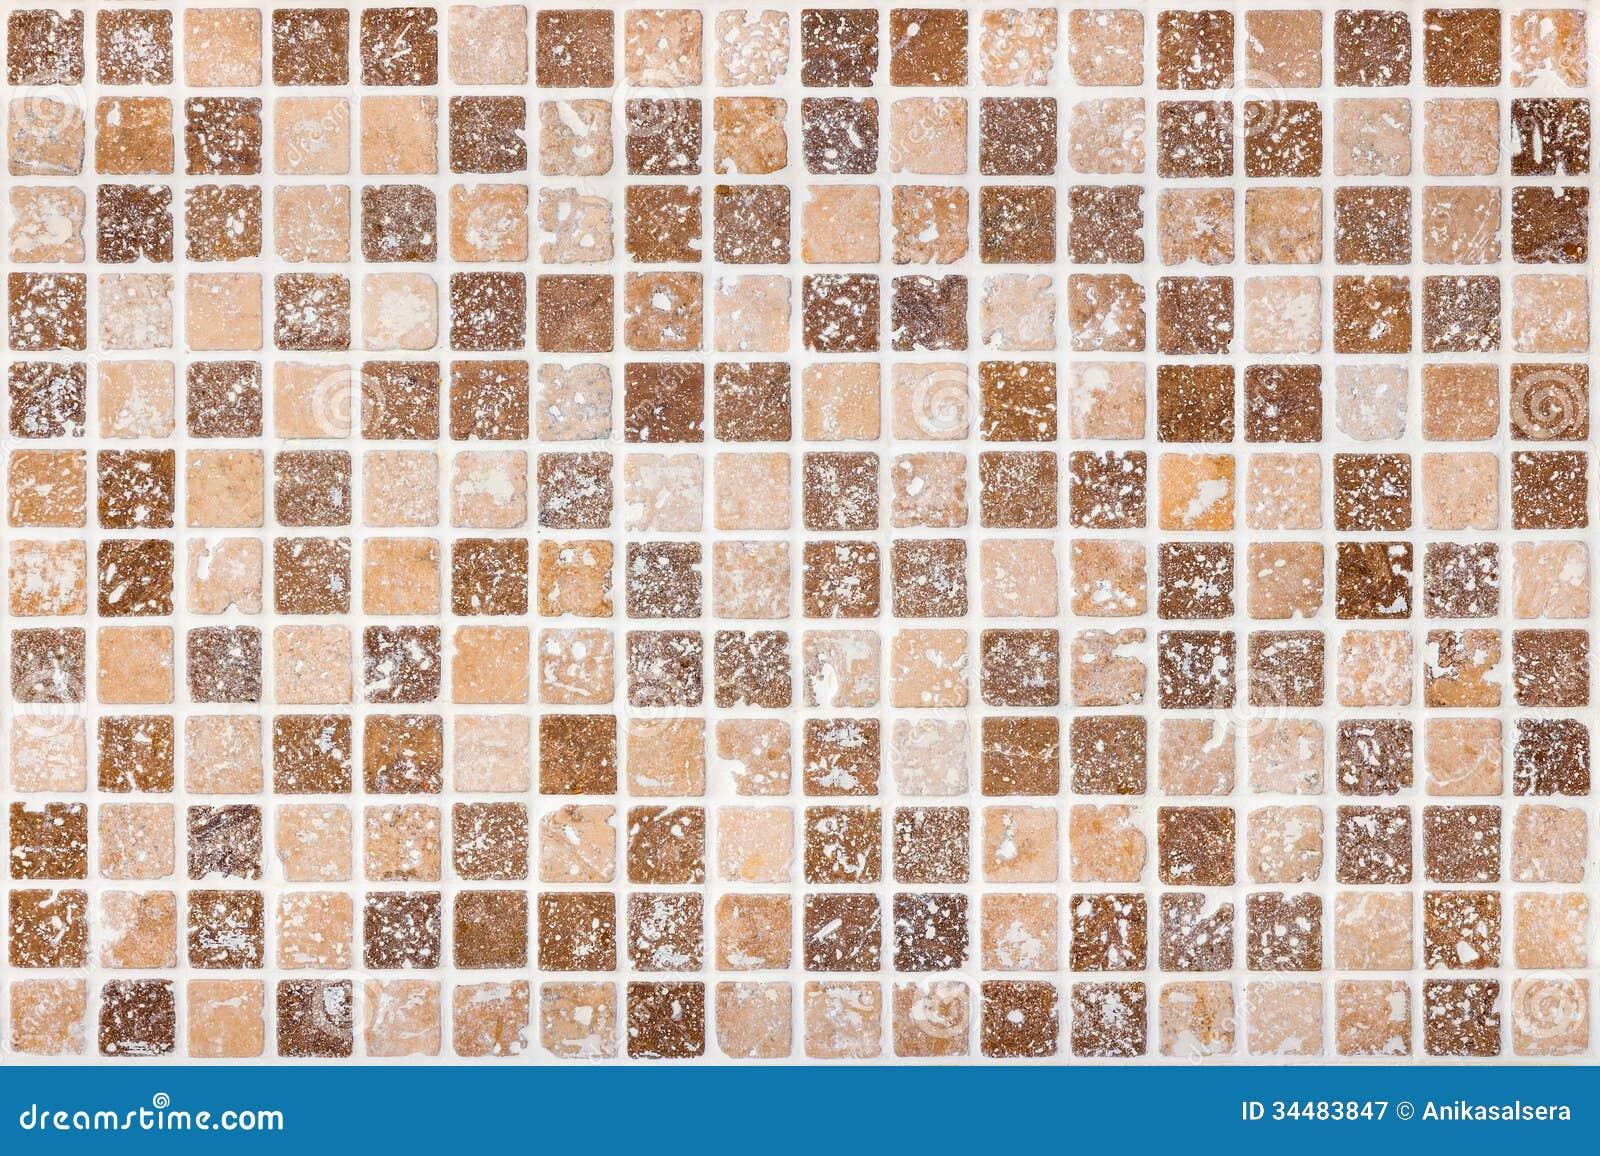 Ceramic Tile Background Royalty Free Stock Photography